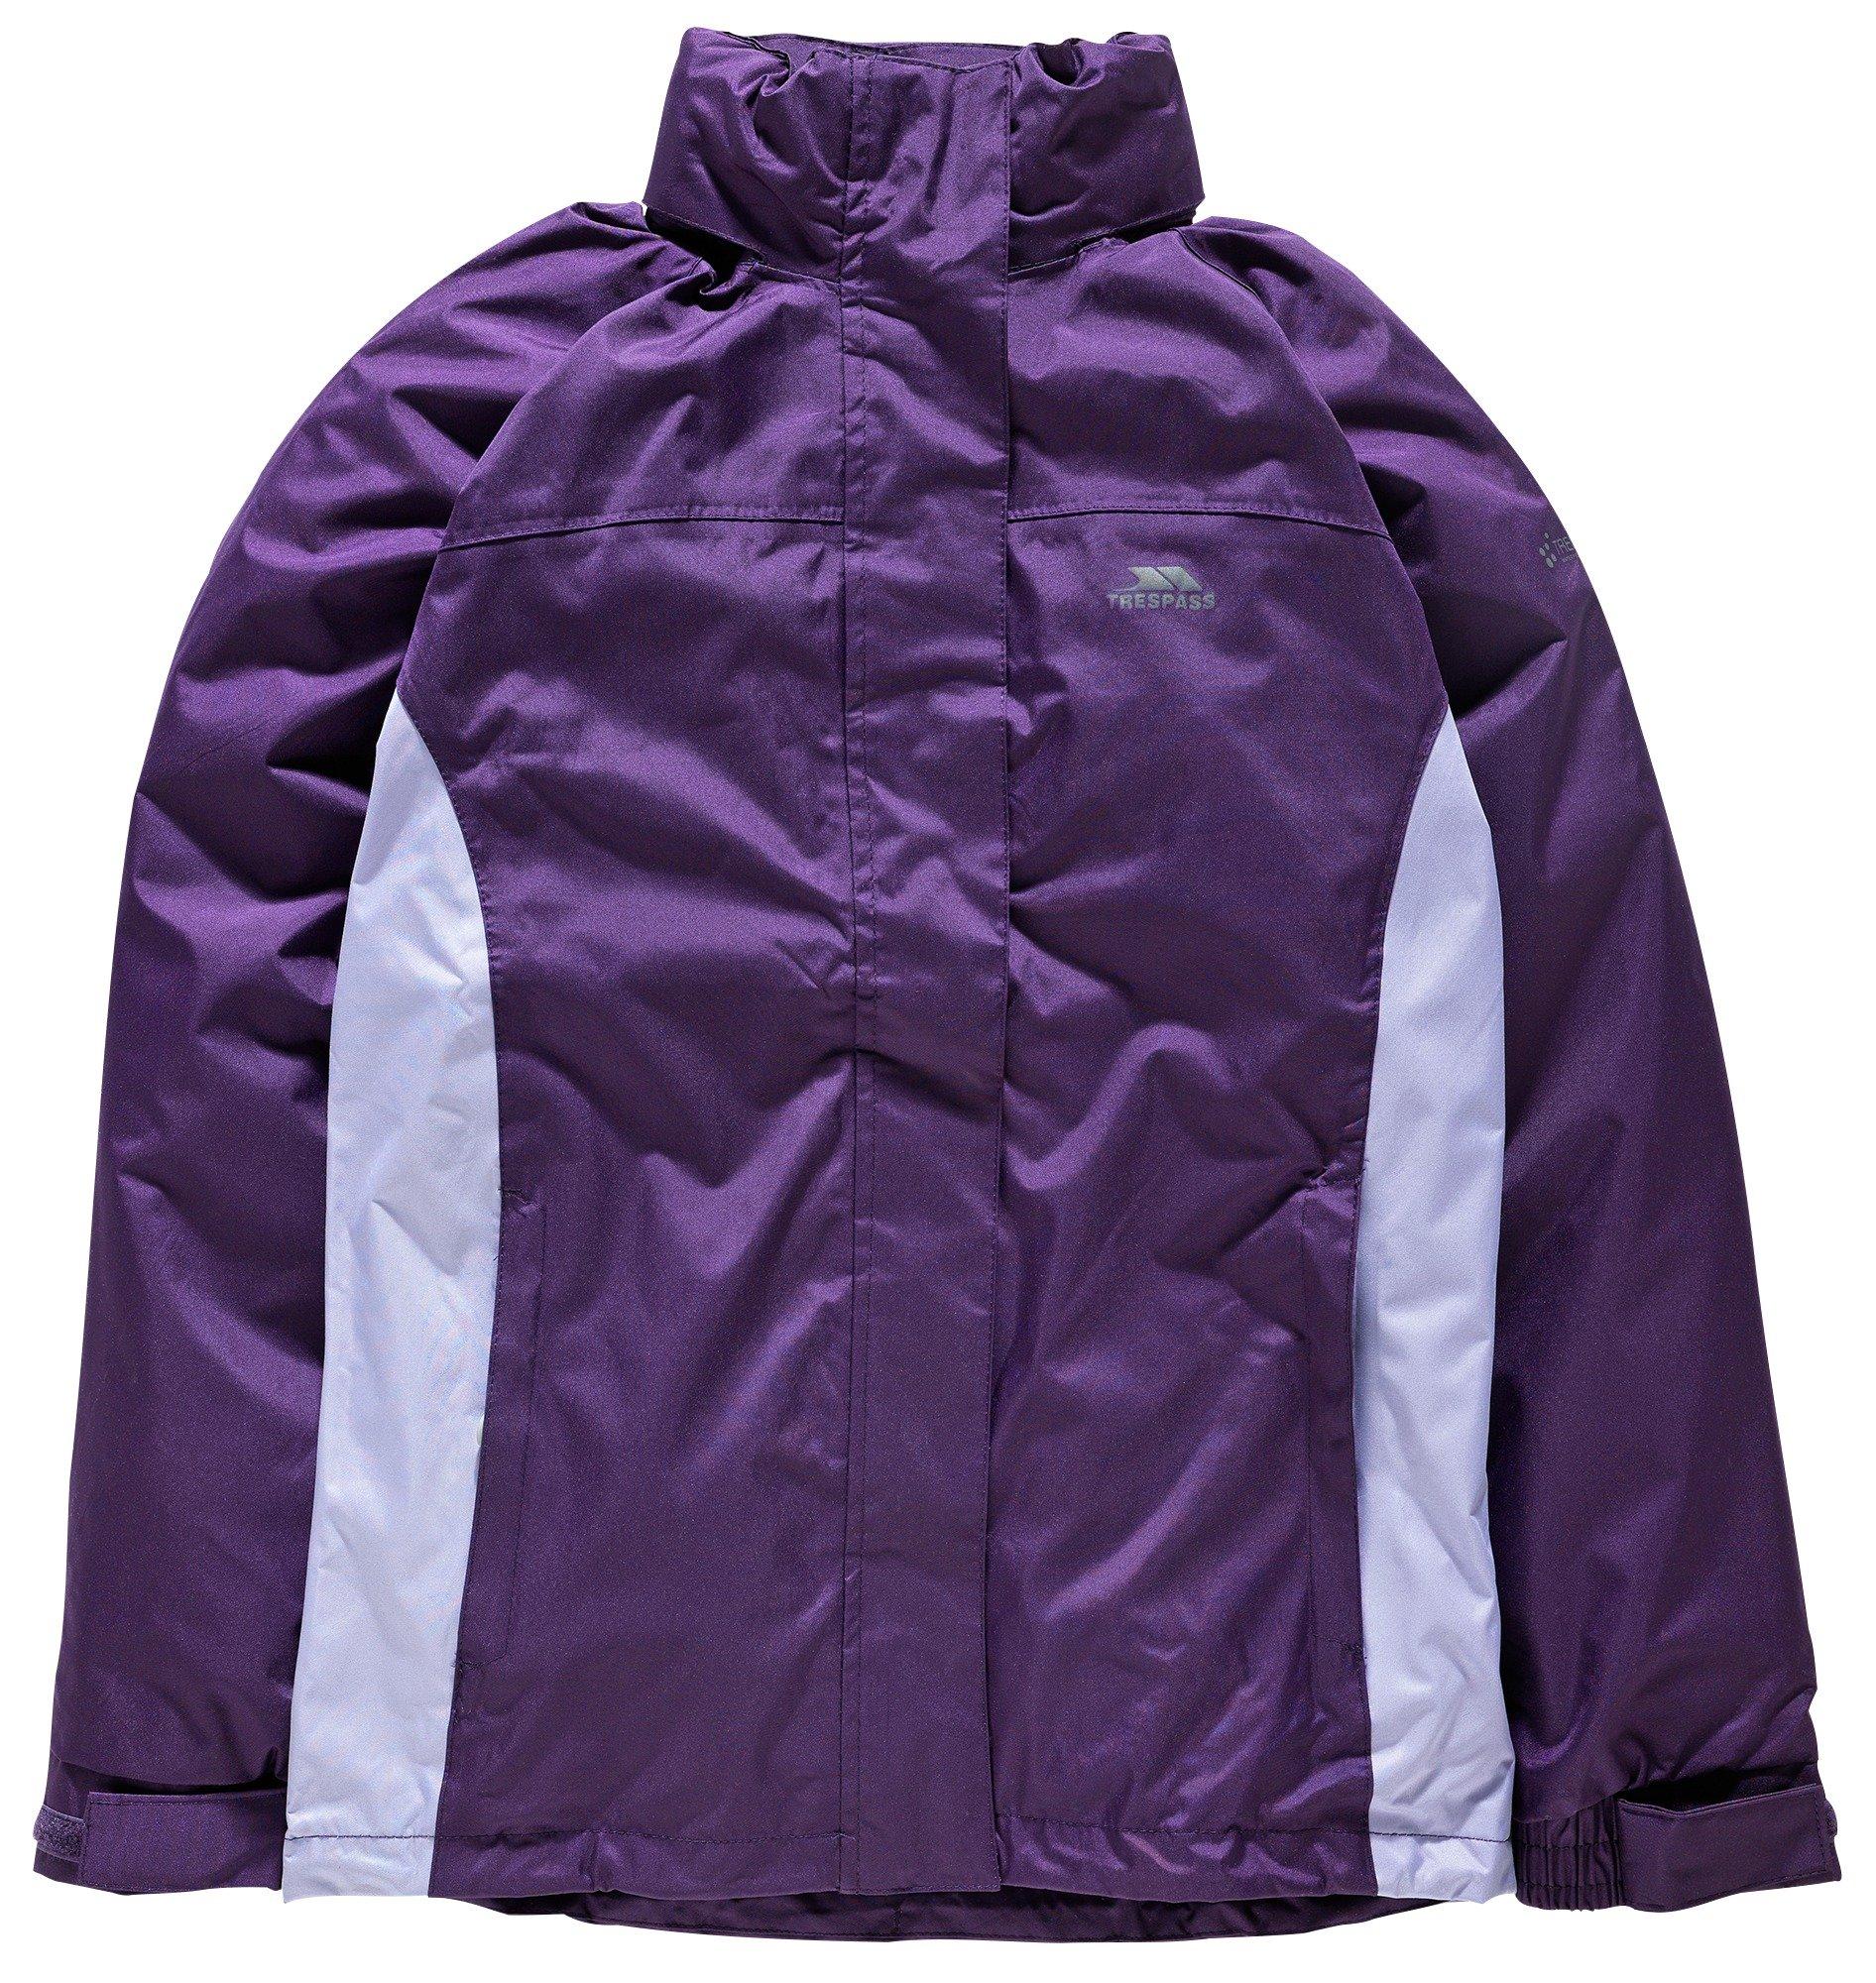 Image of Trespass Ladies' Purple Tarron II Jacket - Small